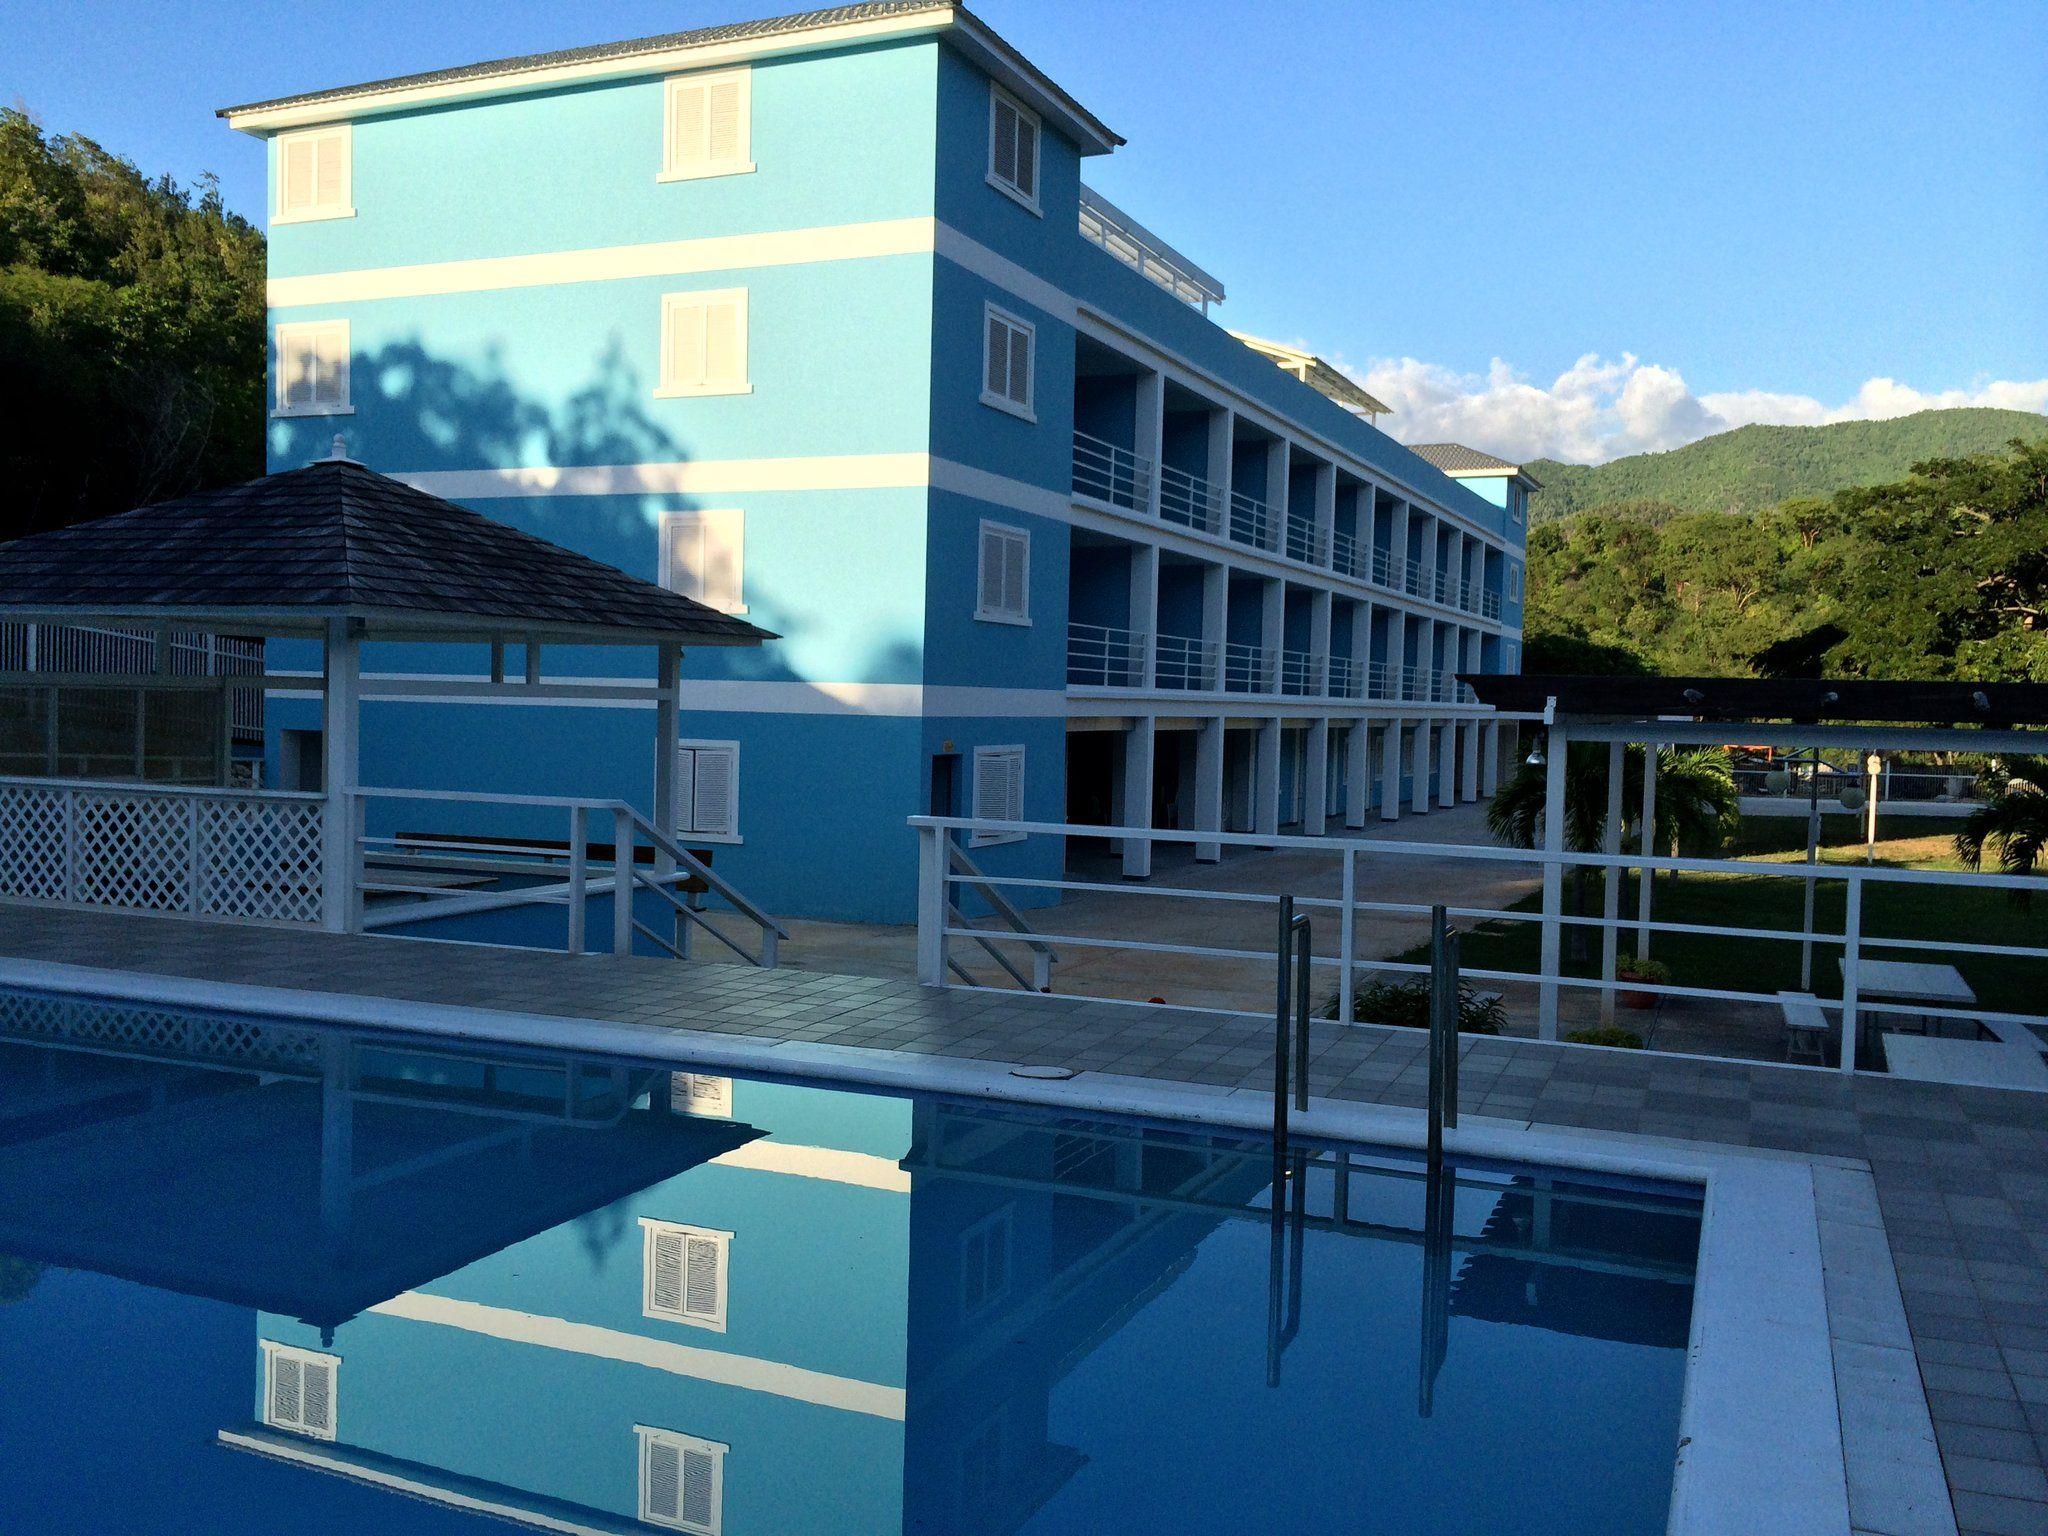 Three Finger Jack Hotel 30 mins Kingston